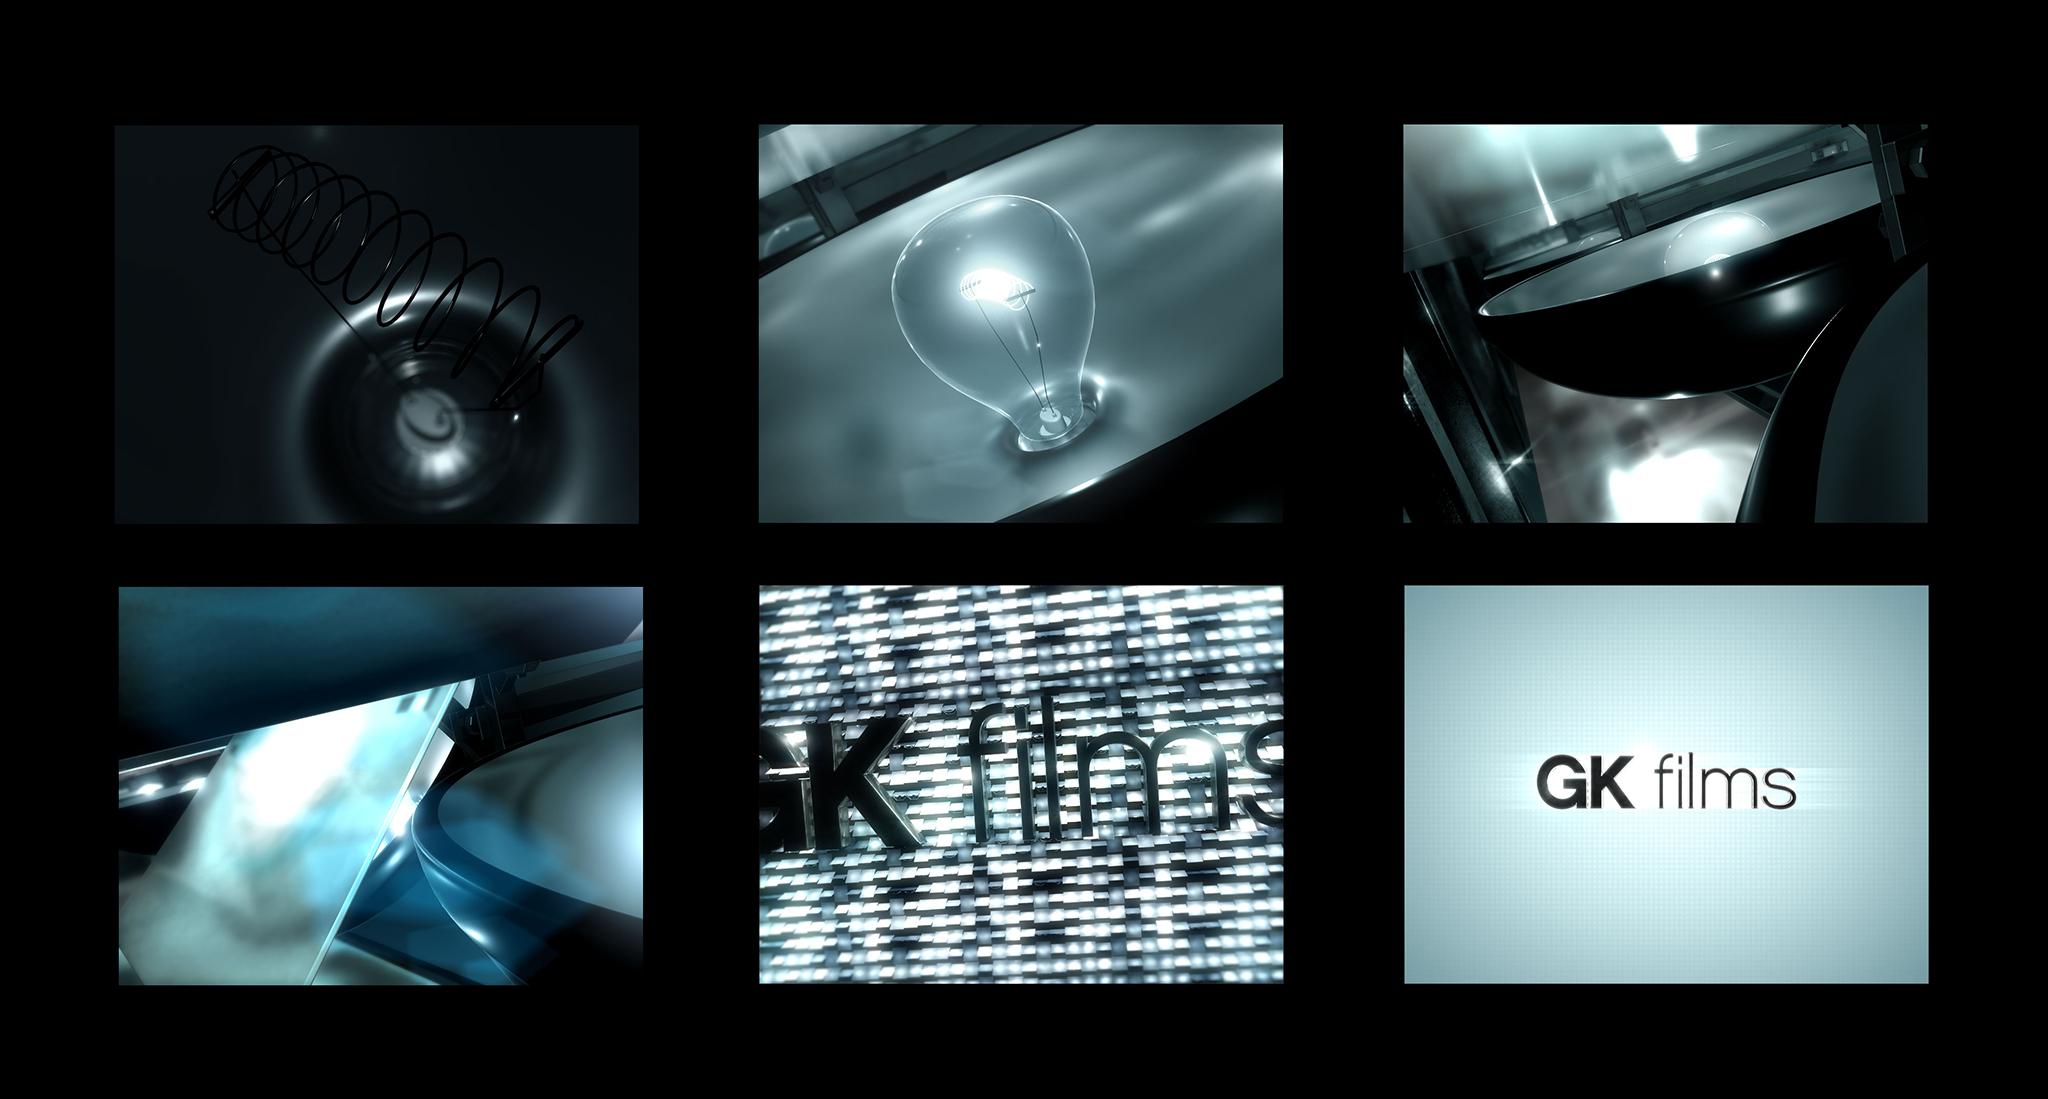 GK_filmsLogo.jpg